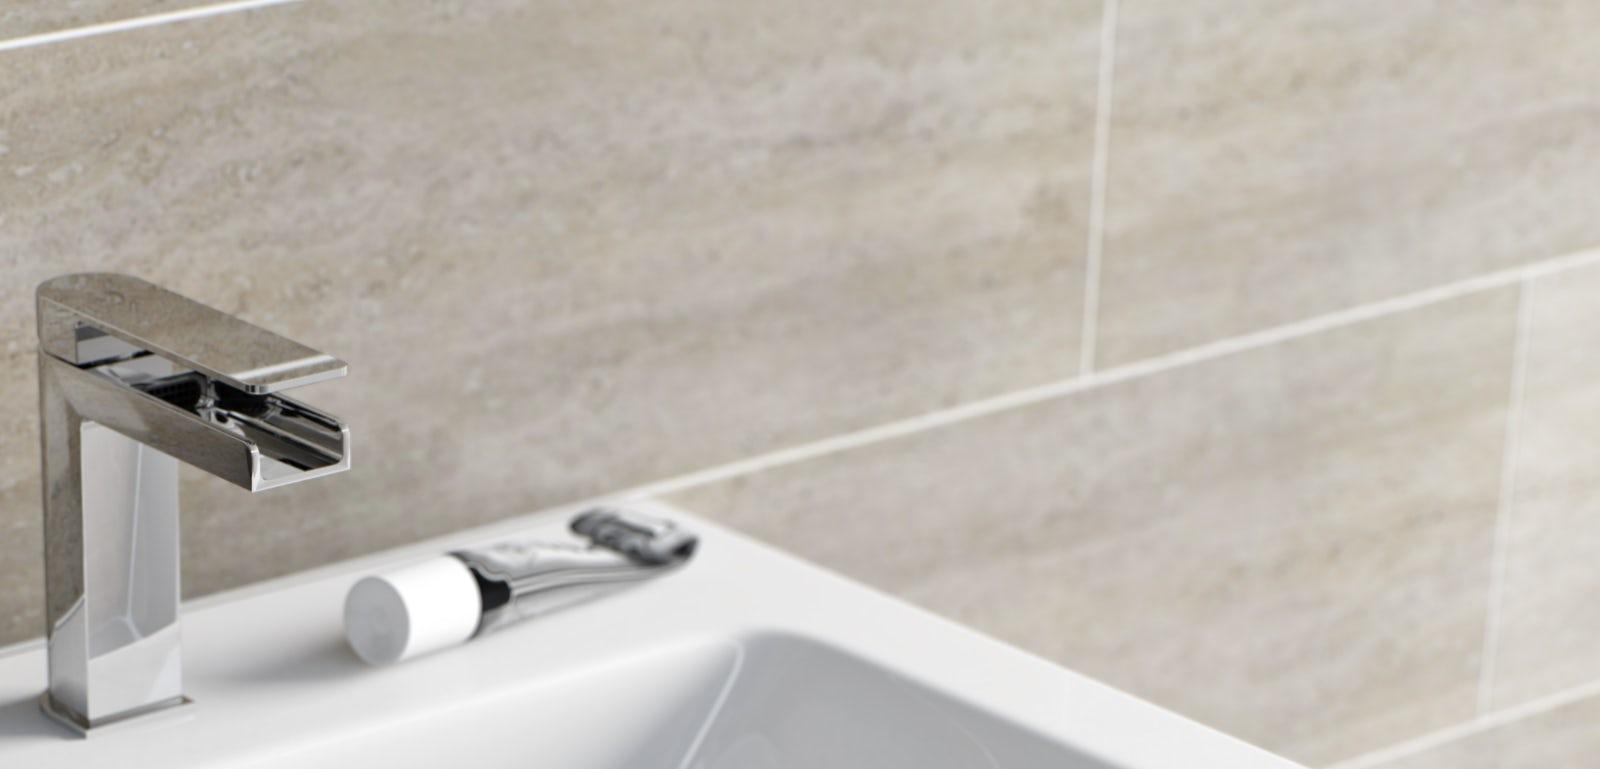 using the bathroom. 5 benefits of using mixer taps in the bathroom Benefits Mixer Taps  VictoriaPlum com